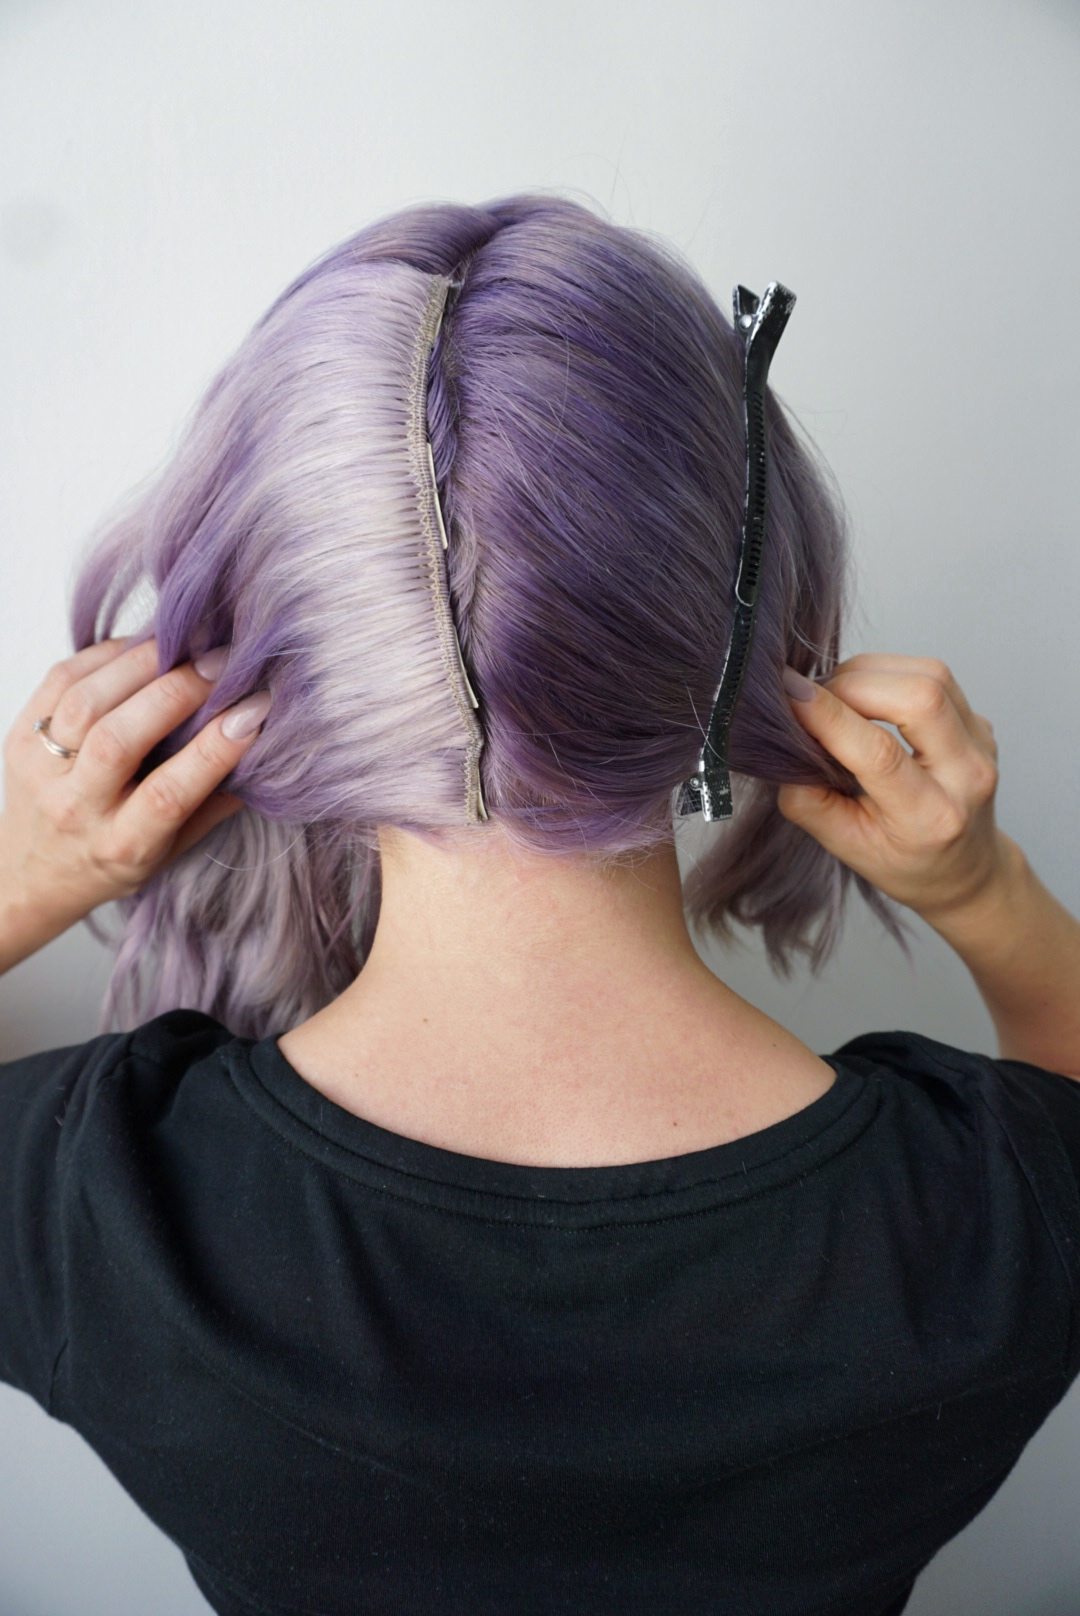 Clip In Hair Extensions For A Side Dutch Braid Cute Girls Hairstyles